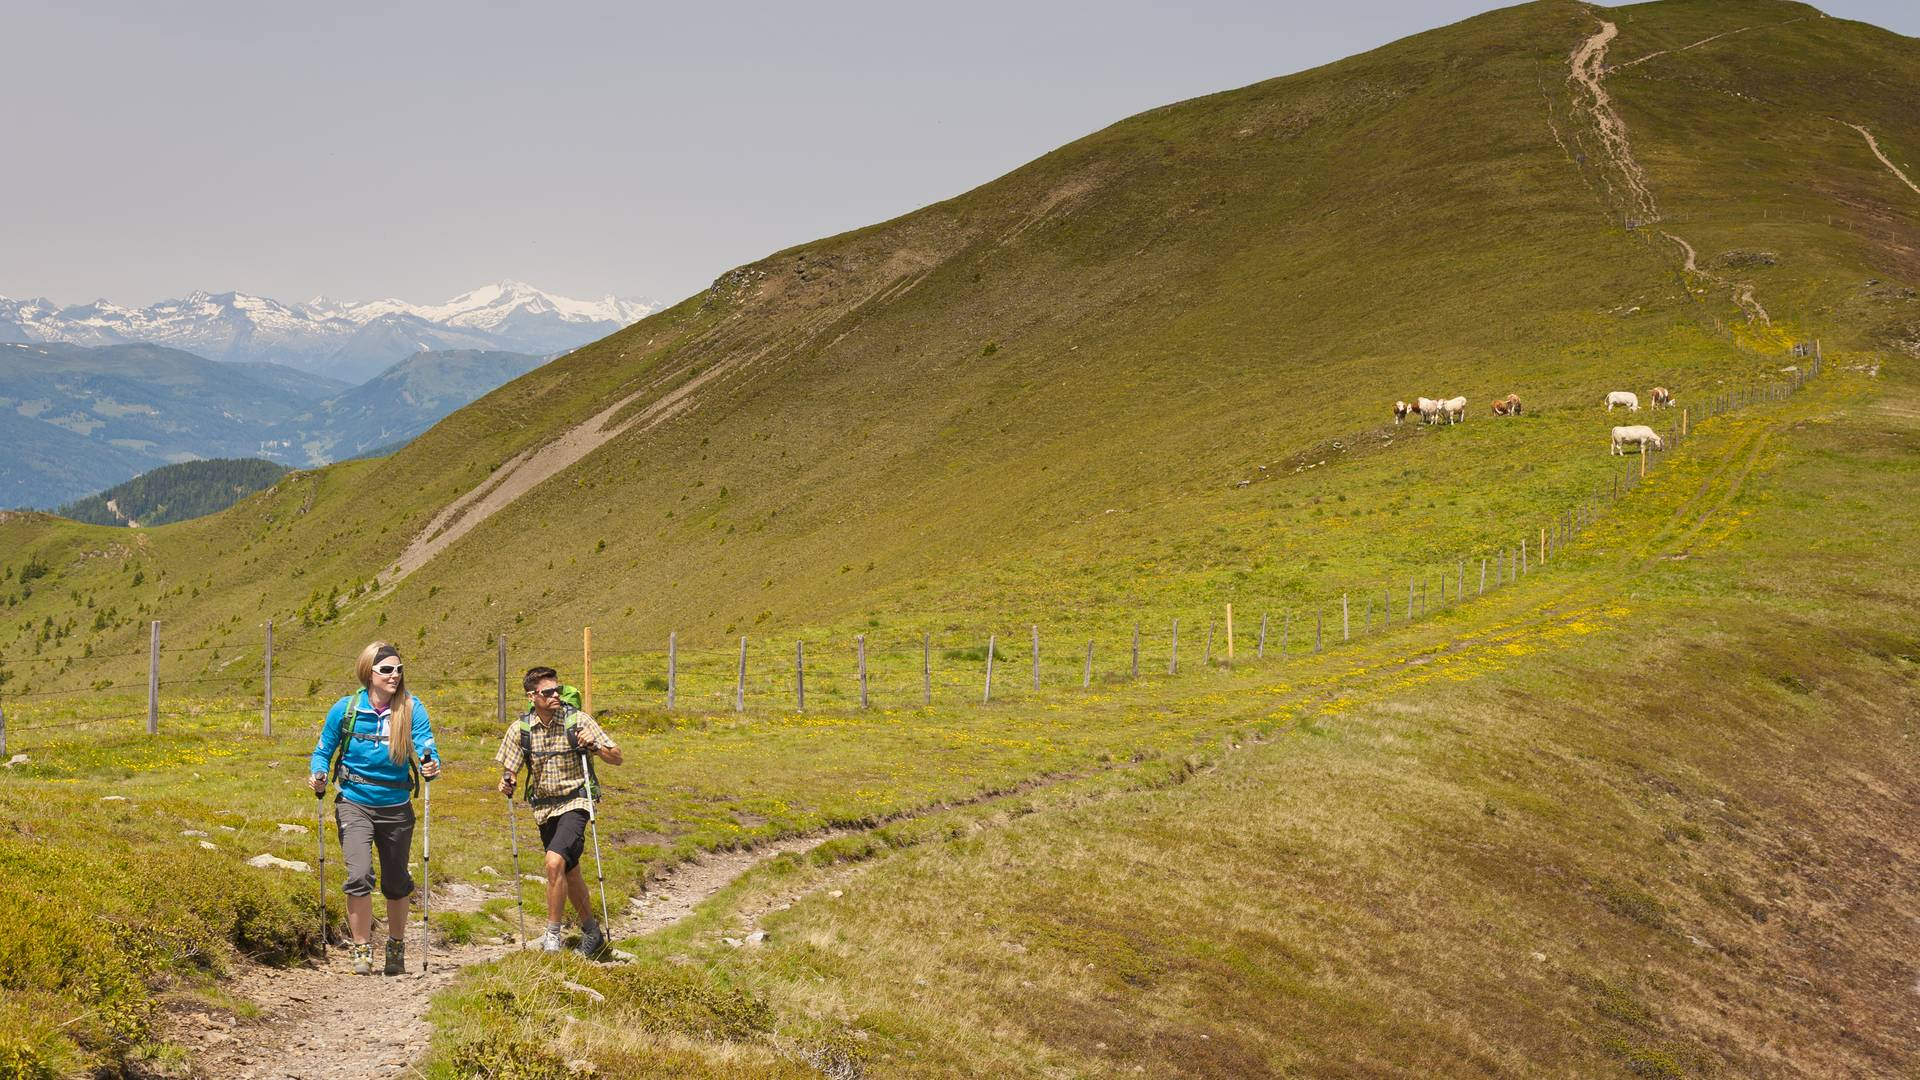 Wandern am Alpe Adria Trail Nockberge